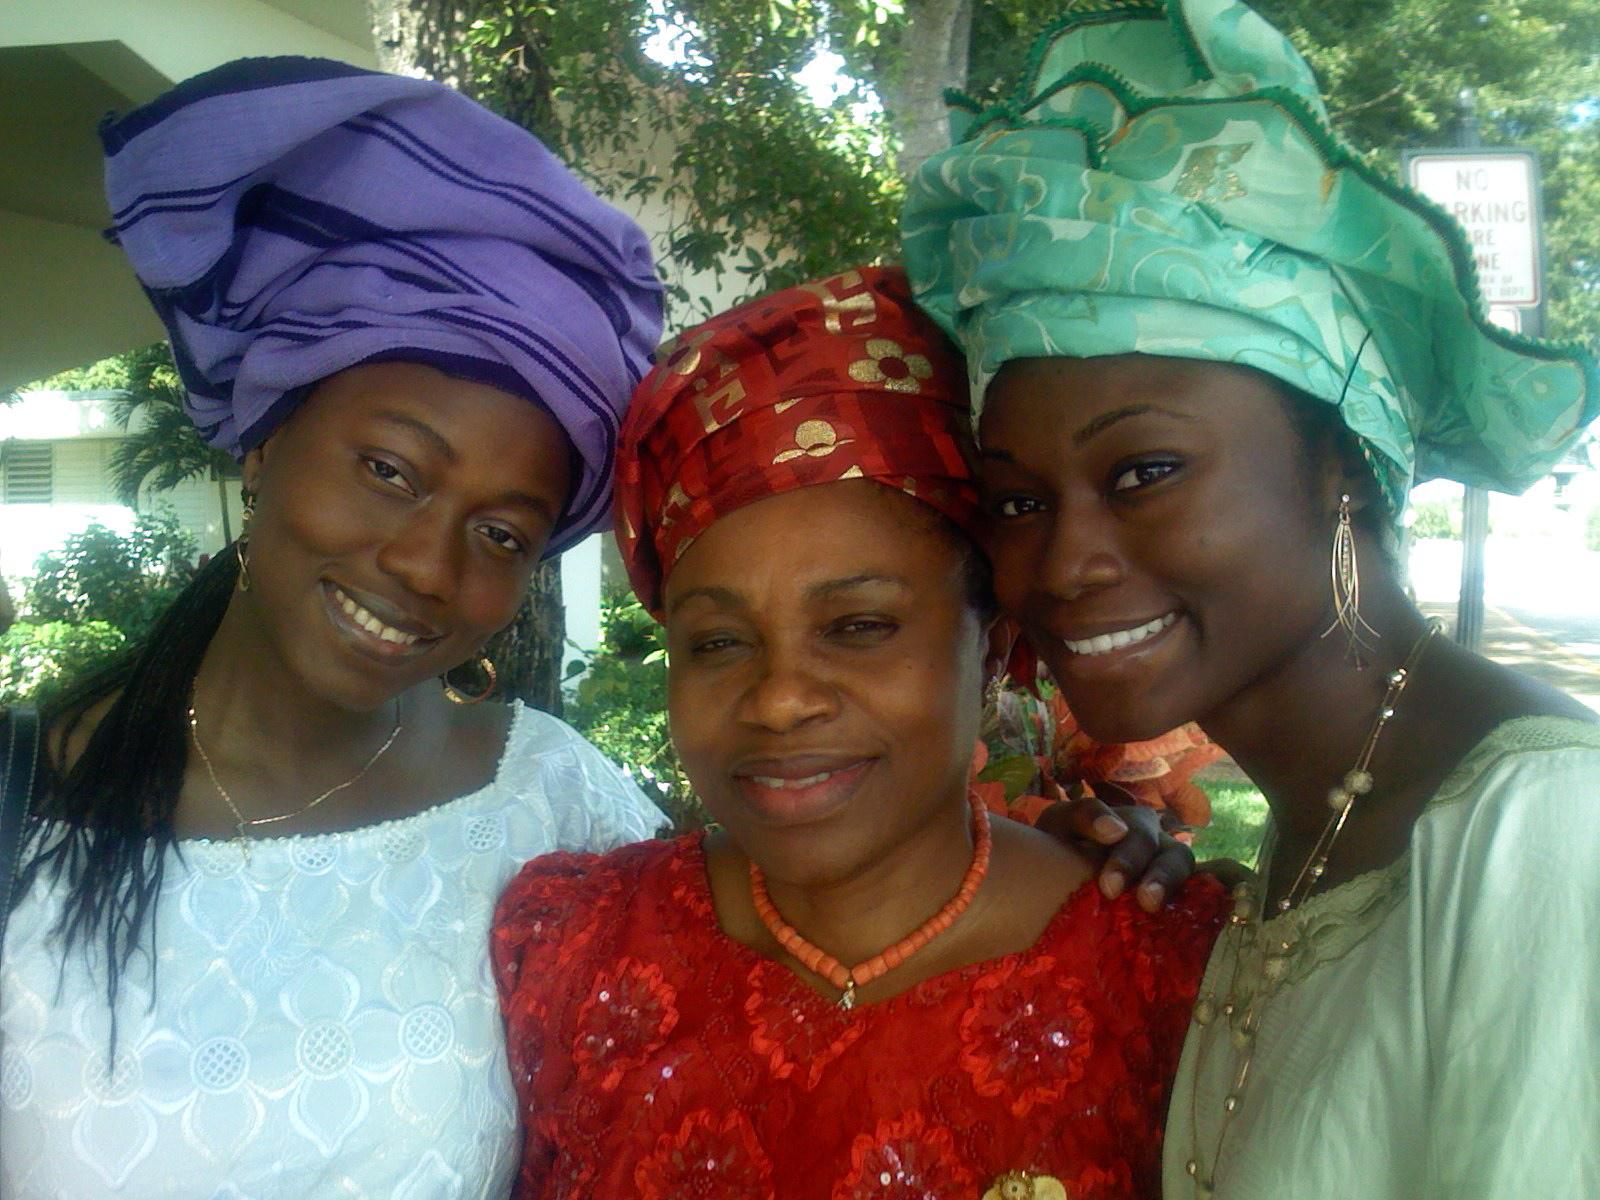 ladies from Ghana in St. Bartholomew's Parish, Miramar, FL, Christmas 2007.